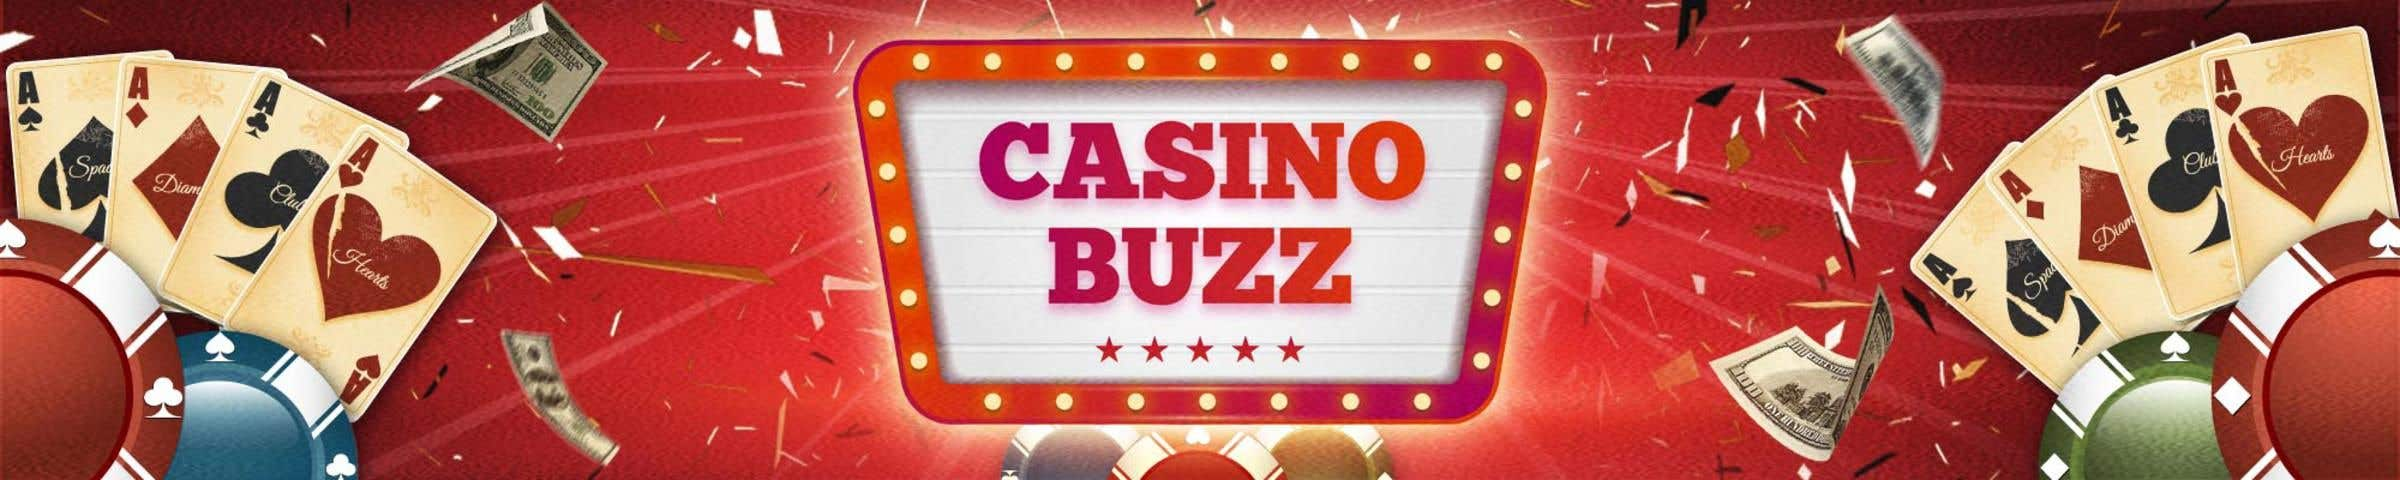 Jupiters Casino fart dating campingvogn hekte bly 25